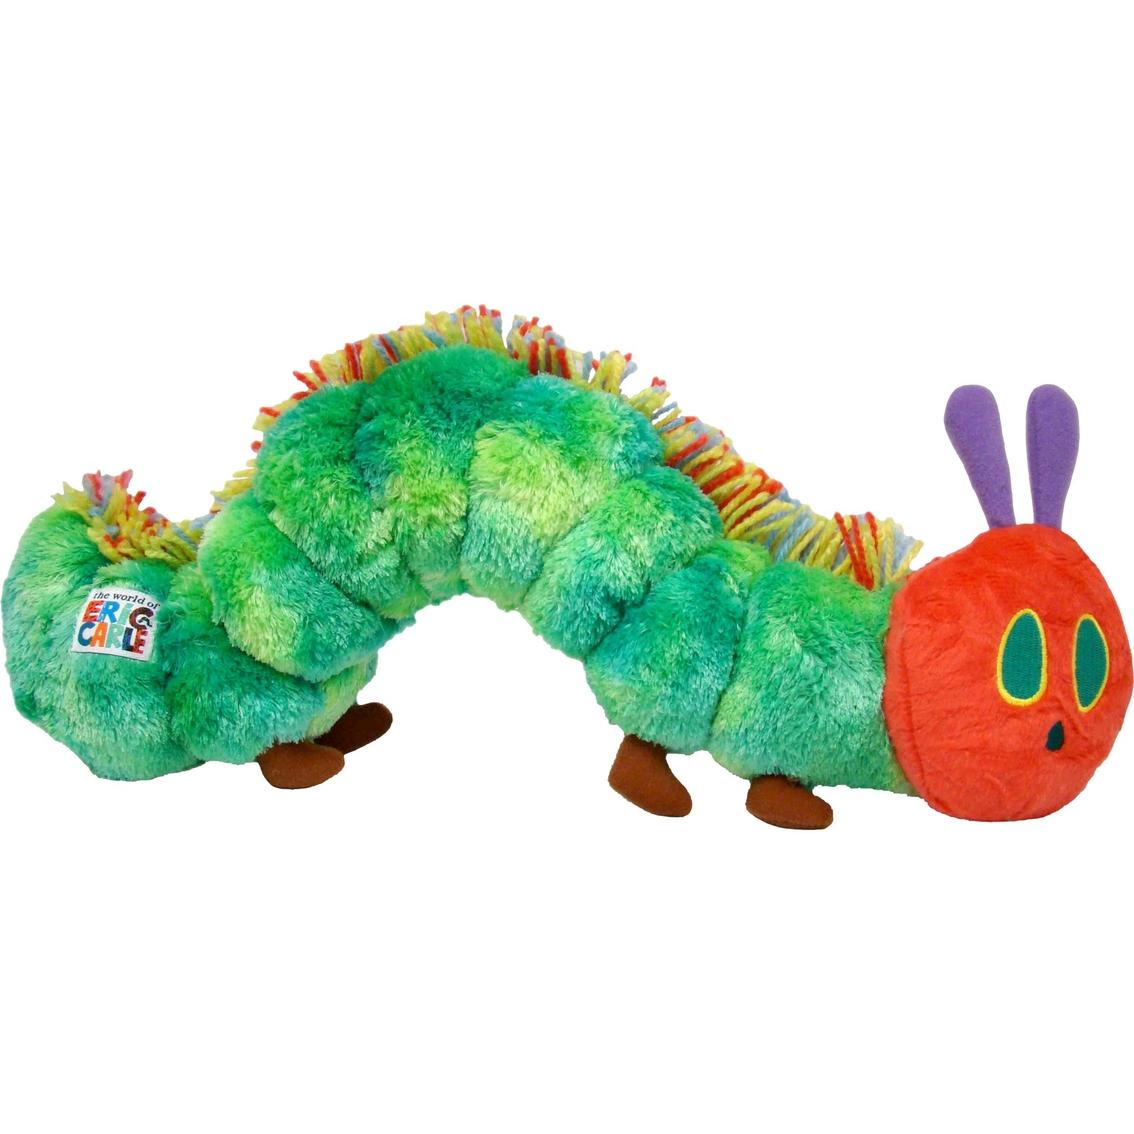 Eric Carle Very Hungry Caterpillar Plush Stuffed Toys Baby